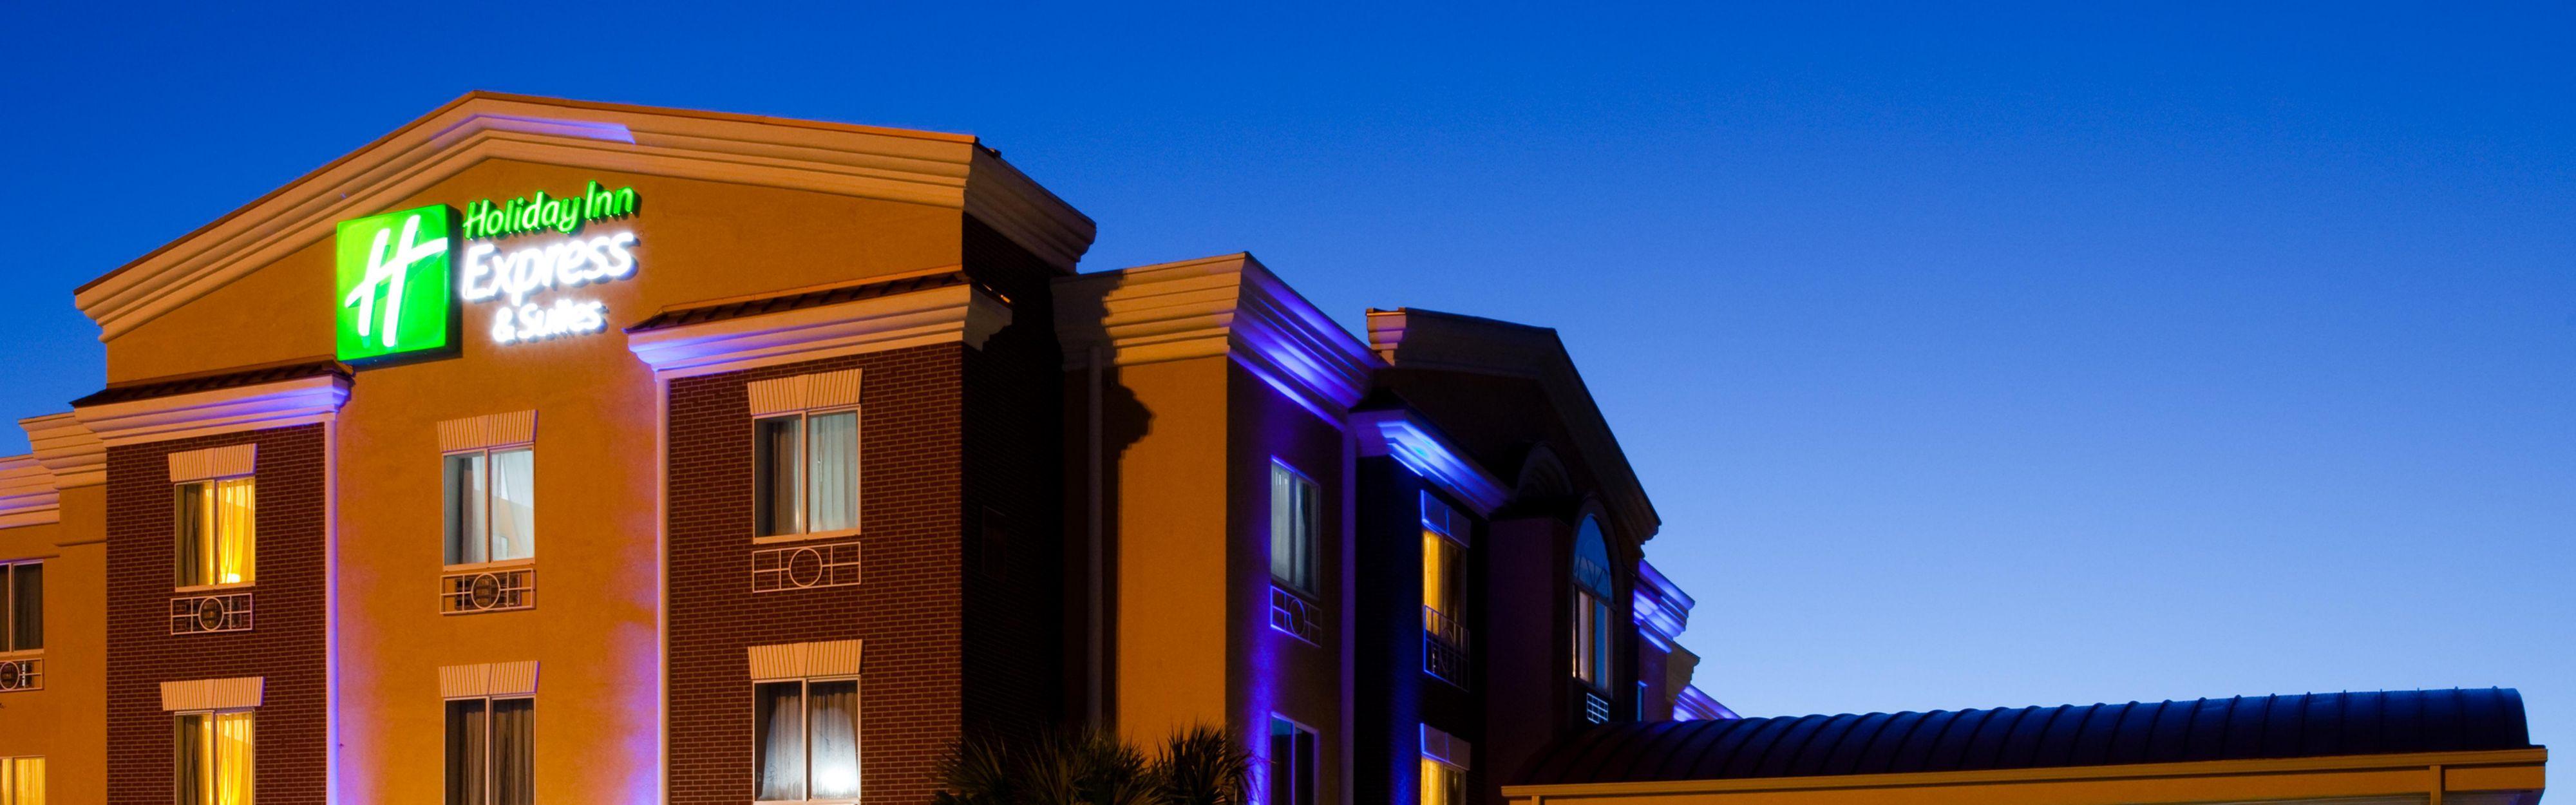 Holiday Inn Express & Suites Brooksville-I-75 image 0